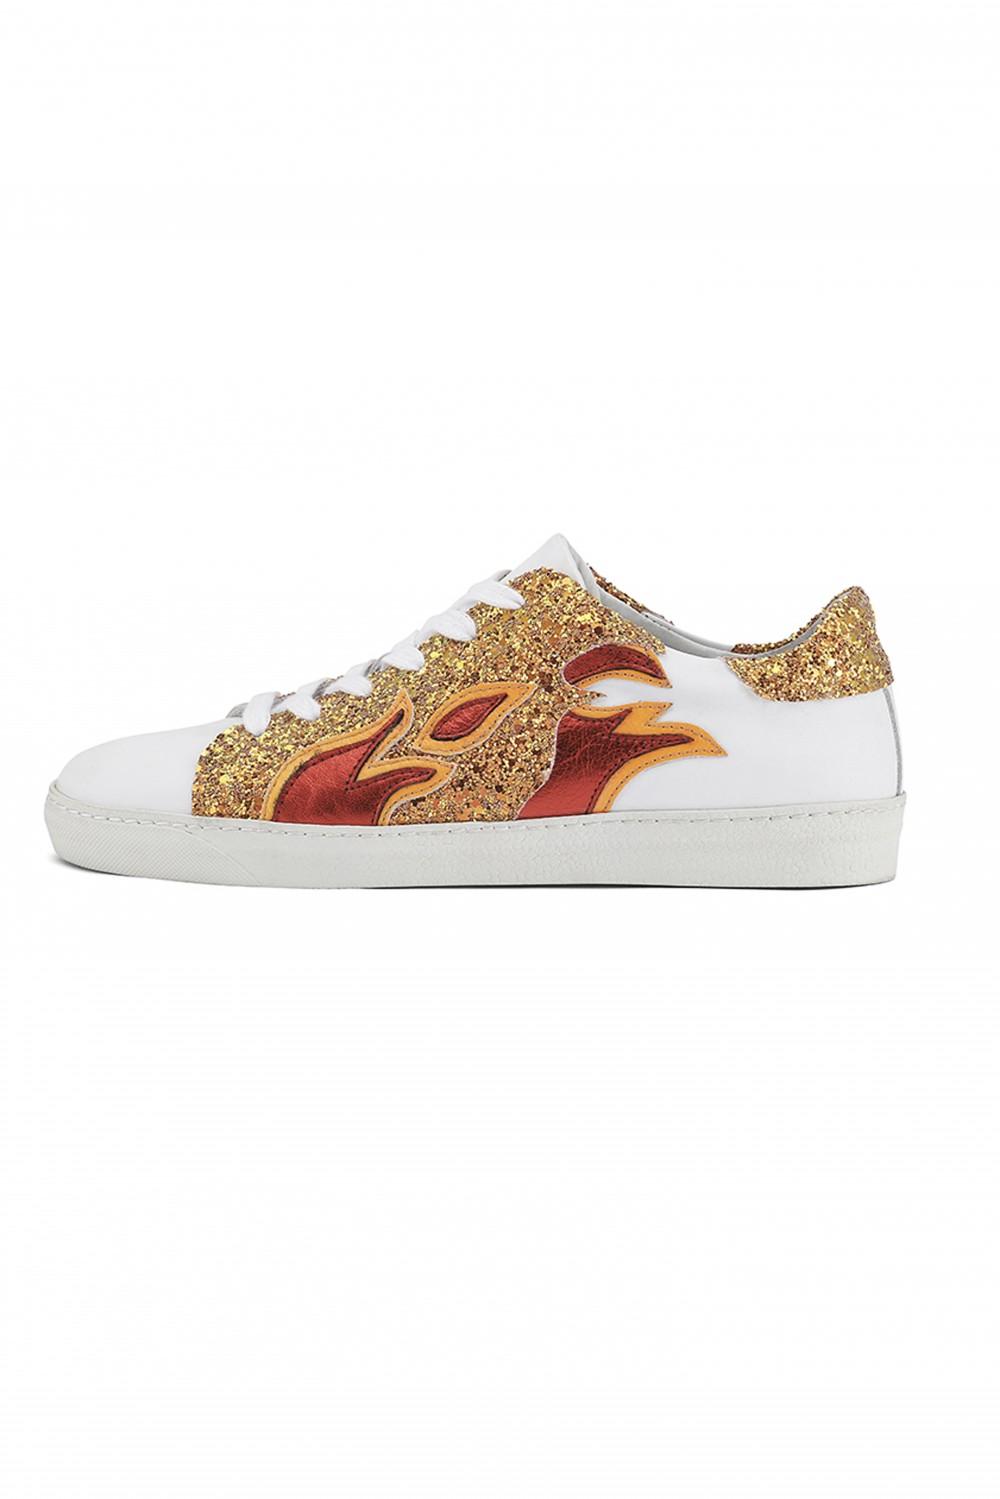 Custommade Roberta Shoes